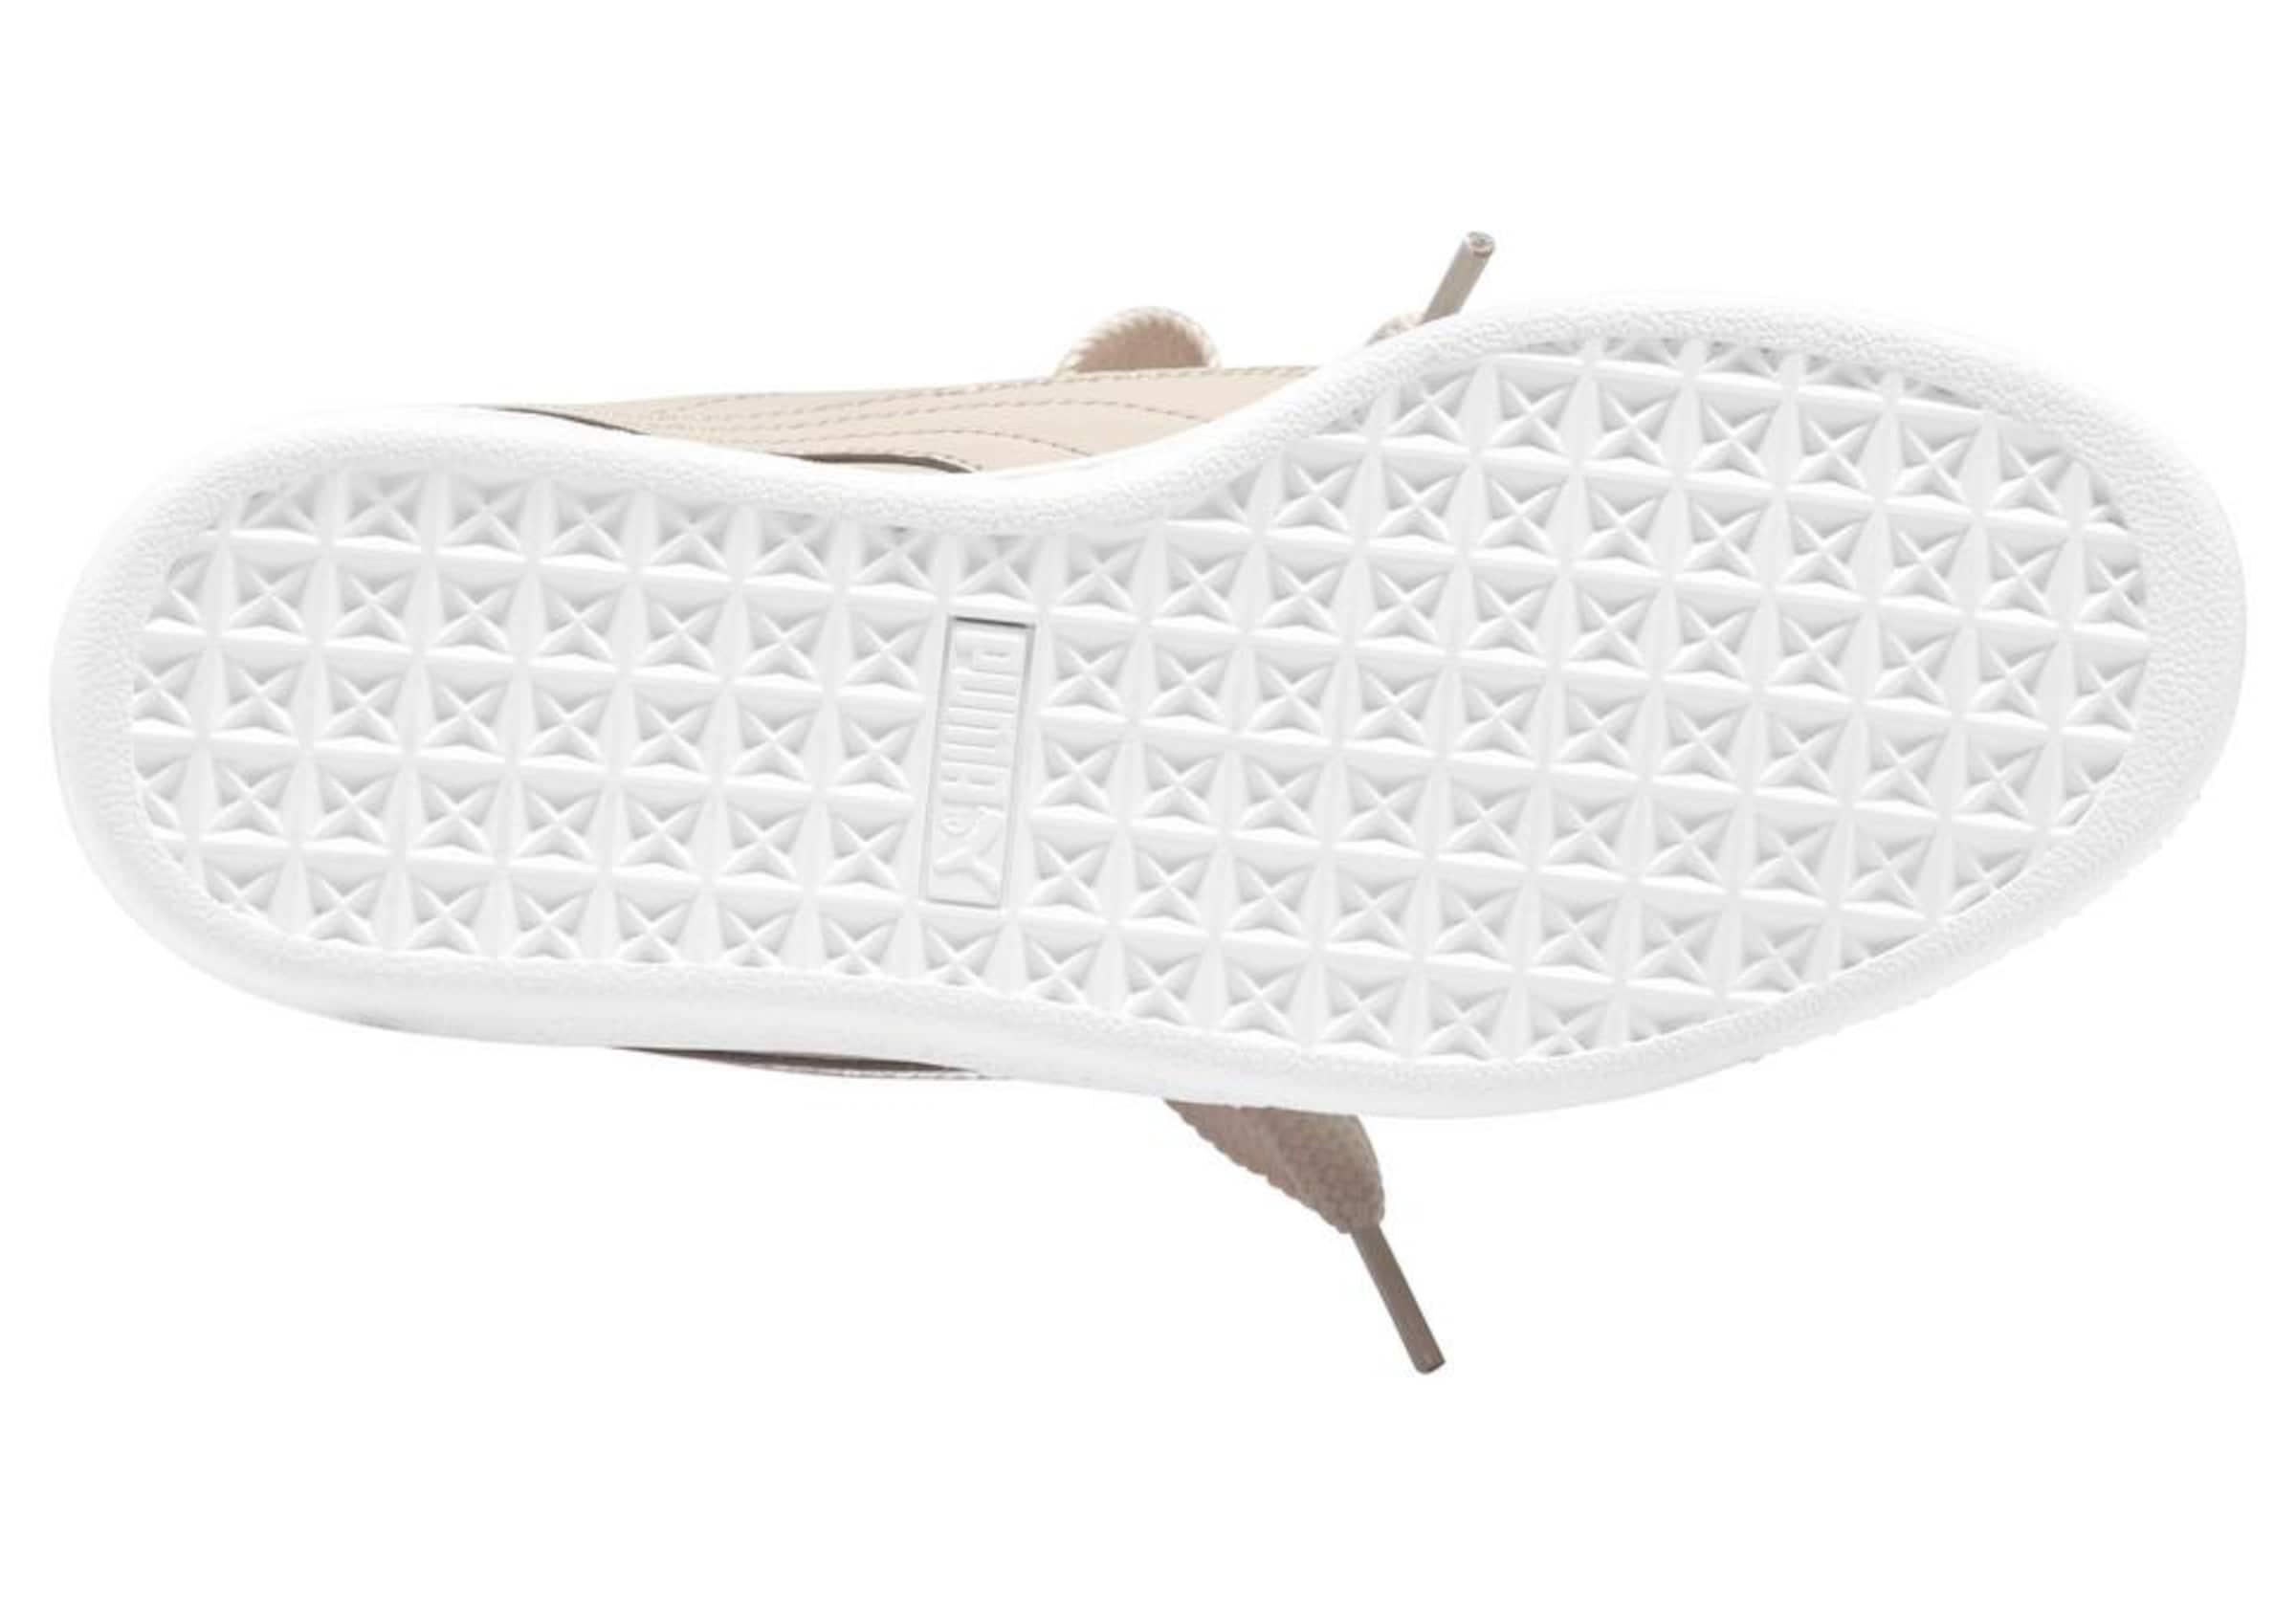 Baskets Patent' En Basses 'basket Heart Camel Puma dhQCrts